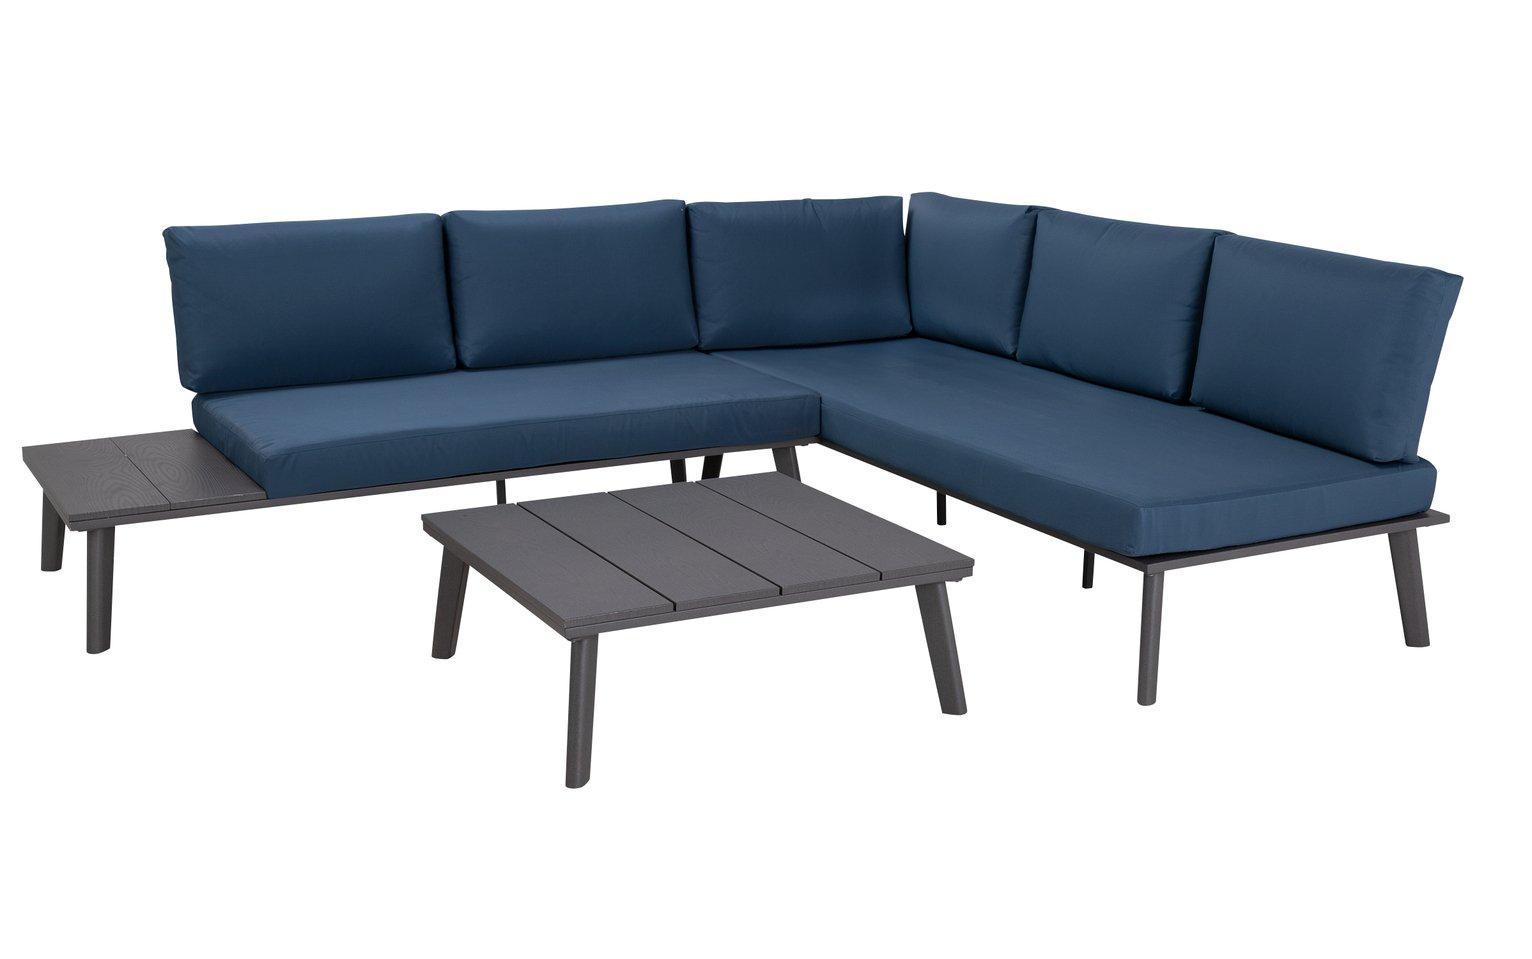 Argos Home Jucar 5 Seater Corner Sofa Set